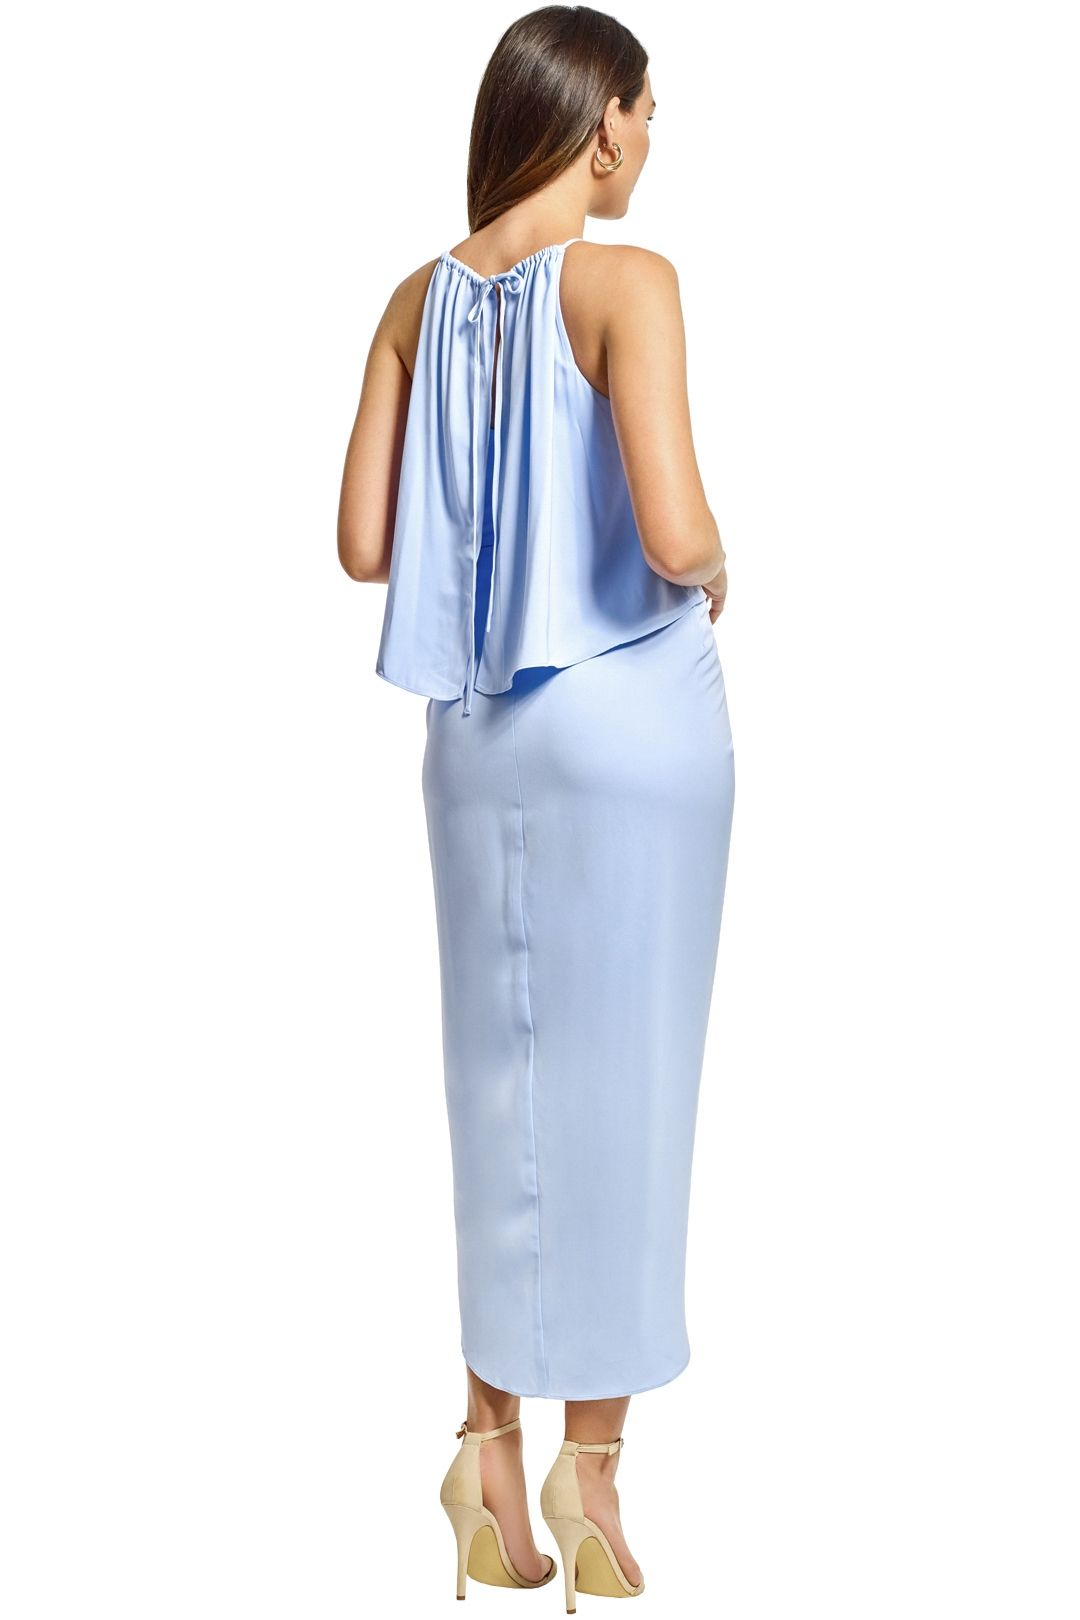 Shona Joy - Frill High Neck Drape Maxi Dress - Cornflower Blue - Back